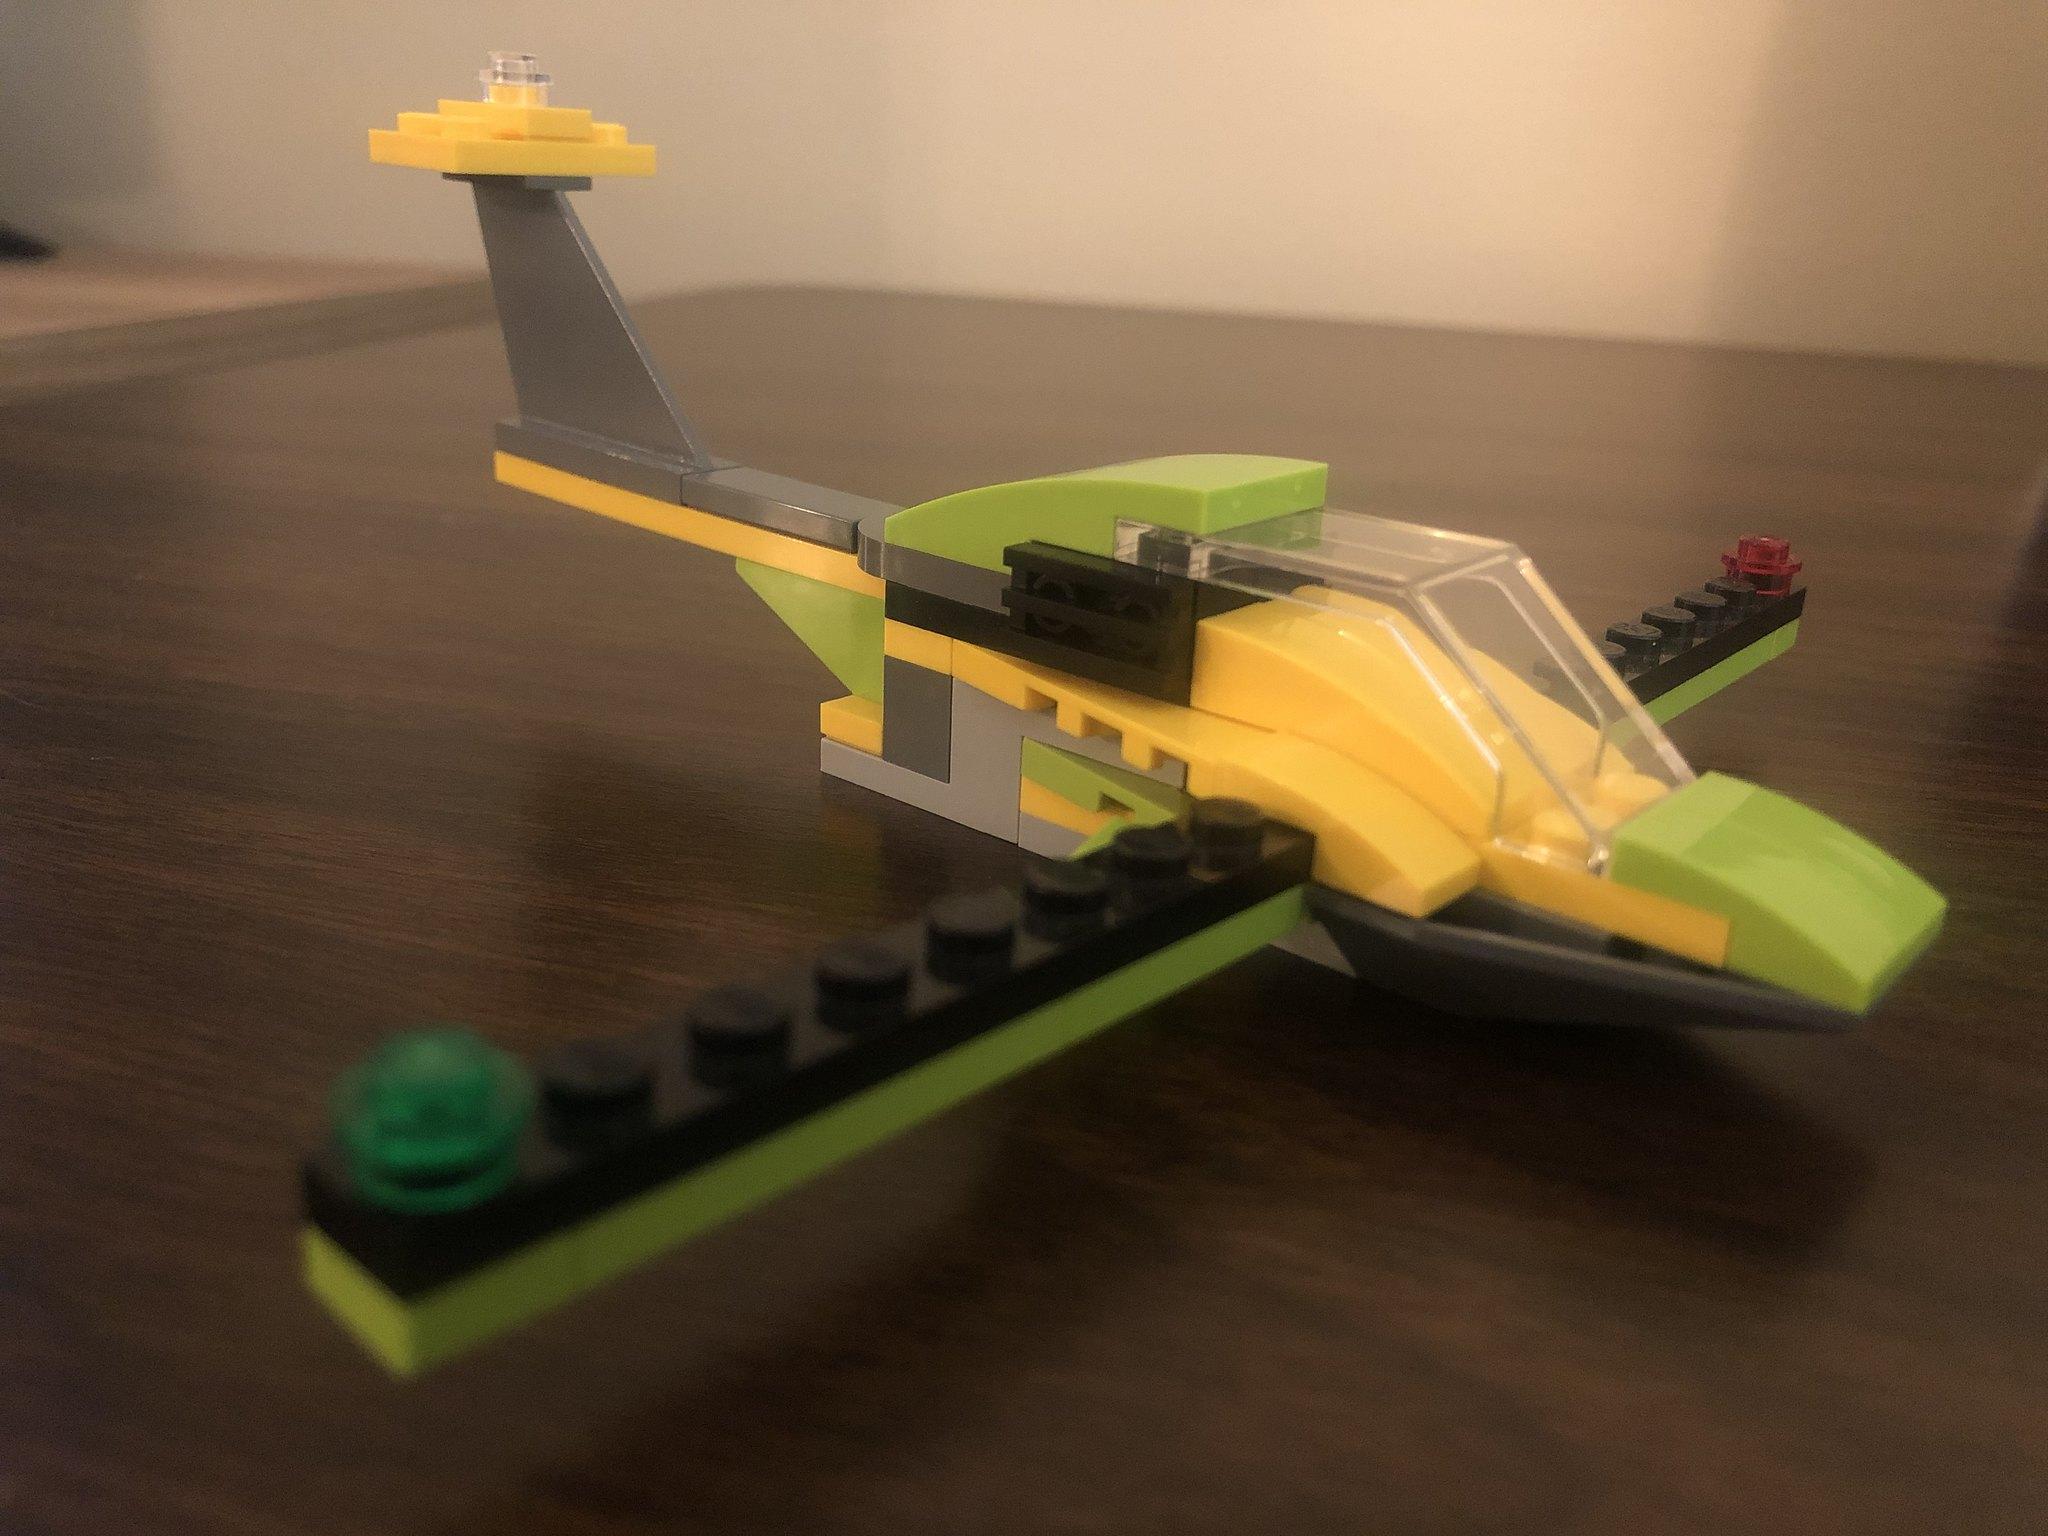 Plane front